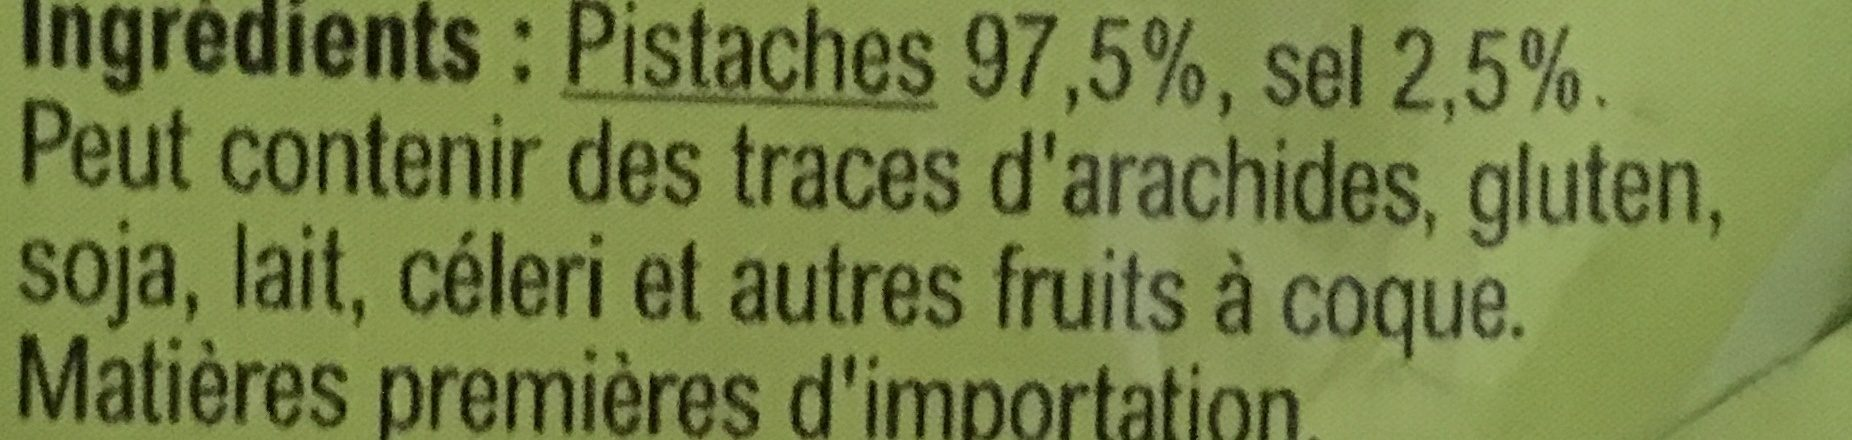 Pistaches grillées salées - Ingrediënten